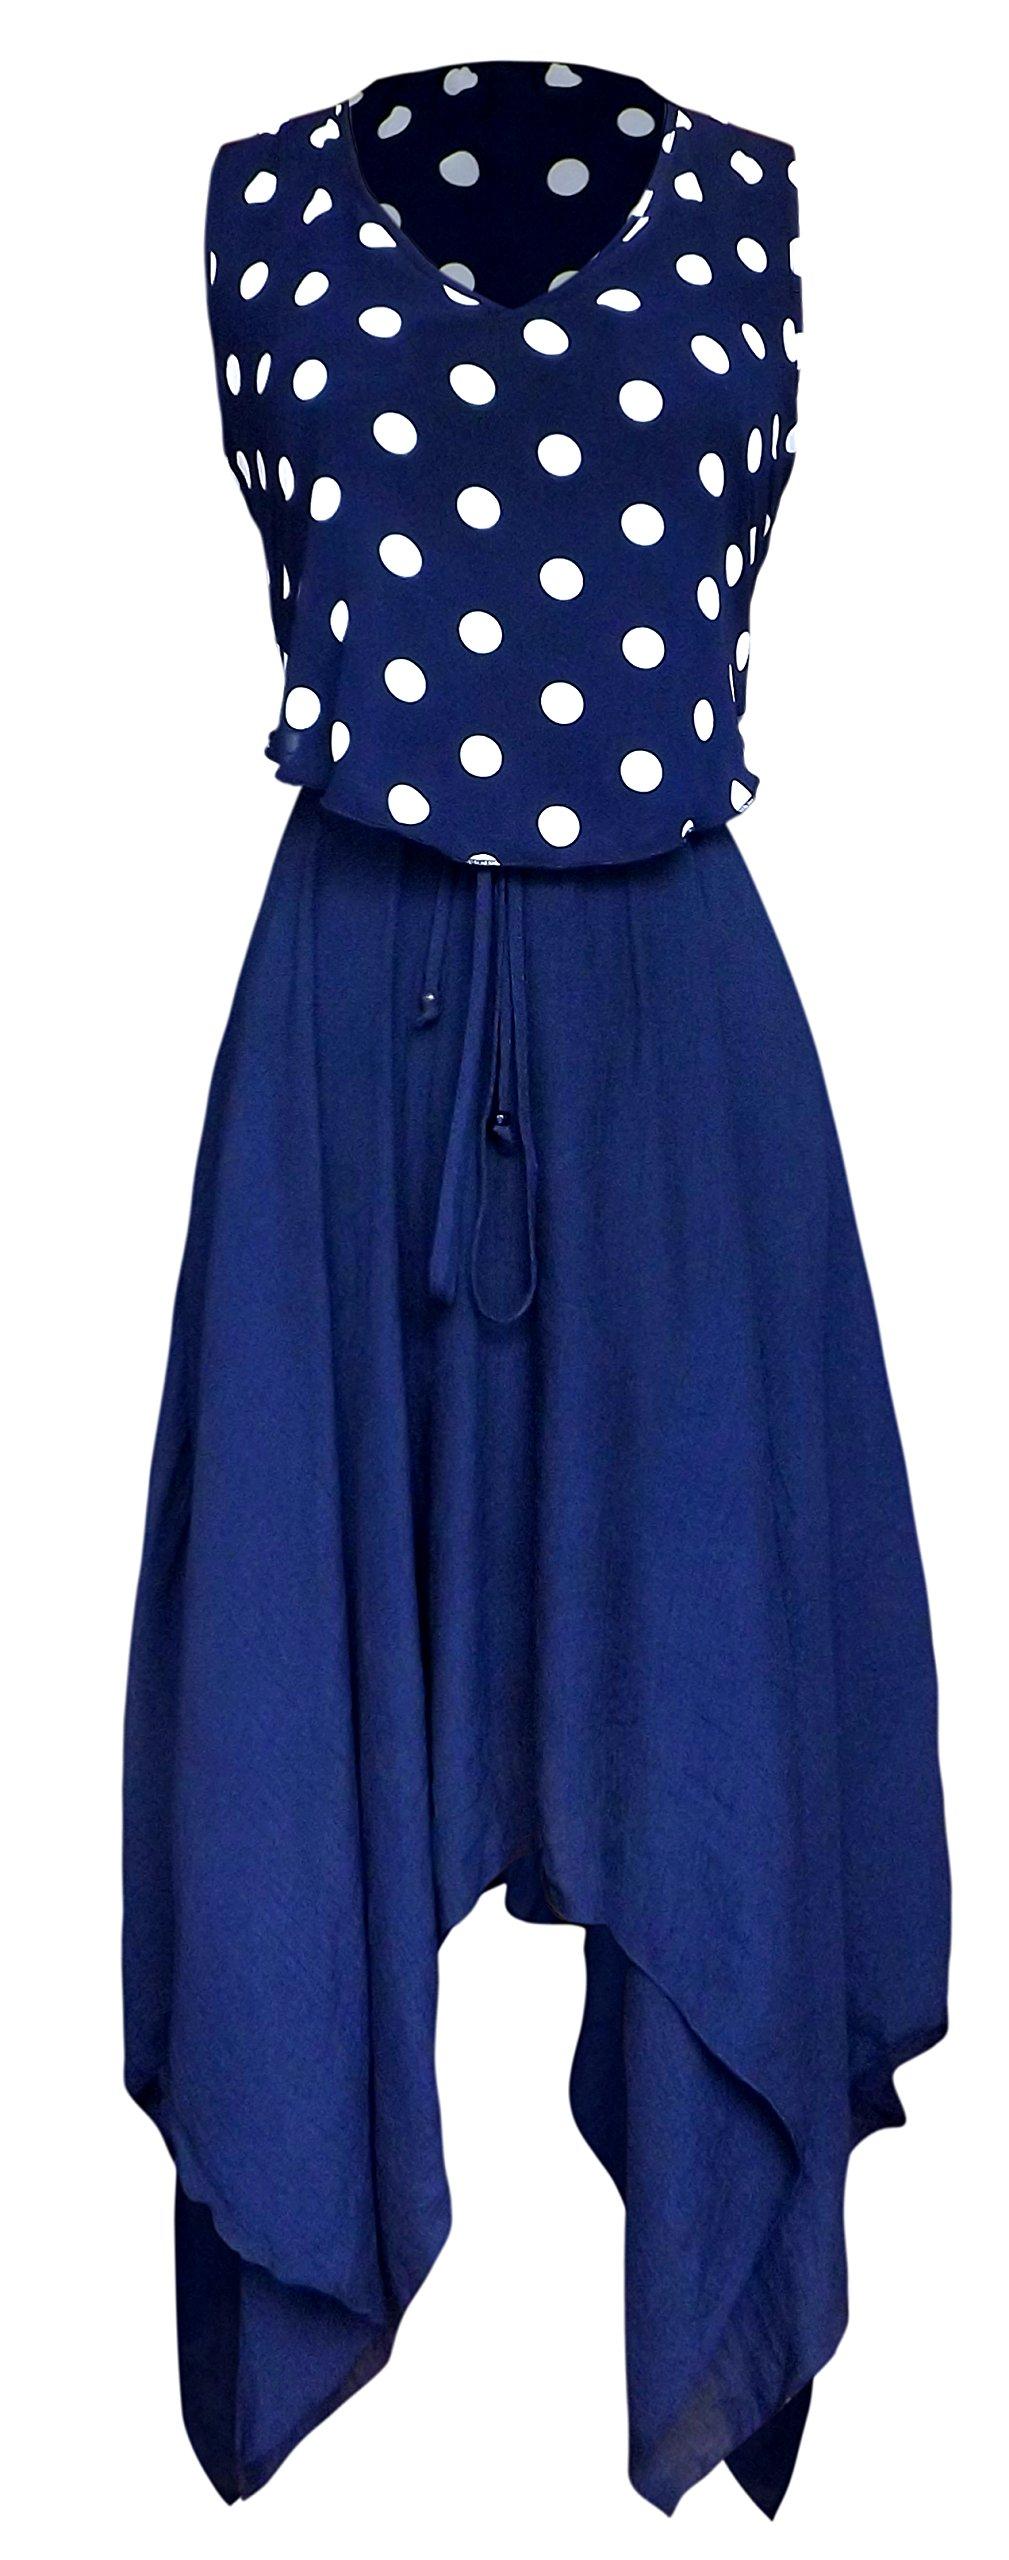 Available at Amazon: Peach Couture Casual Fun Summer Polka Dot Print Asymmetrical Handkerchief Dress